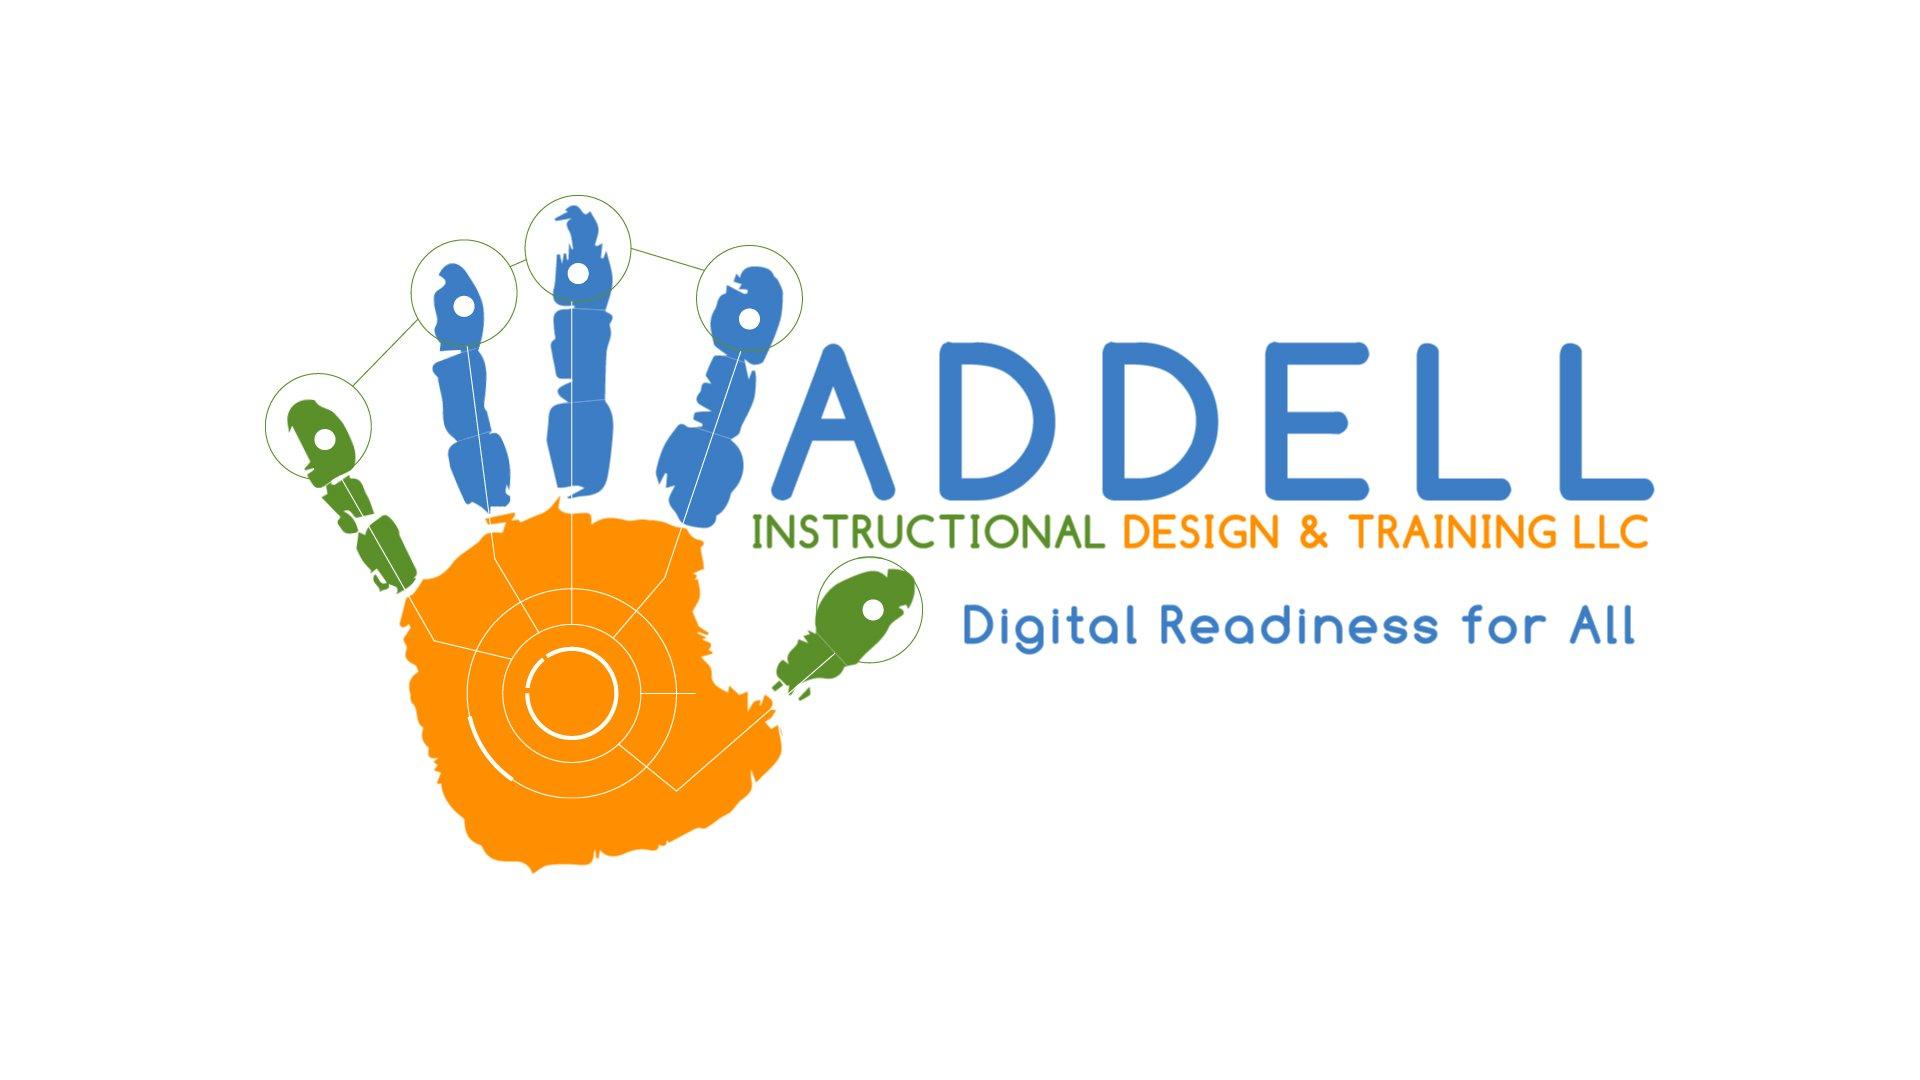 Waddel - Original 2D Logo Design In Vector Format